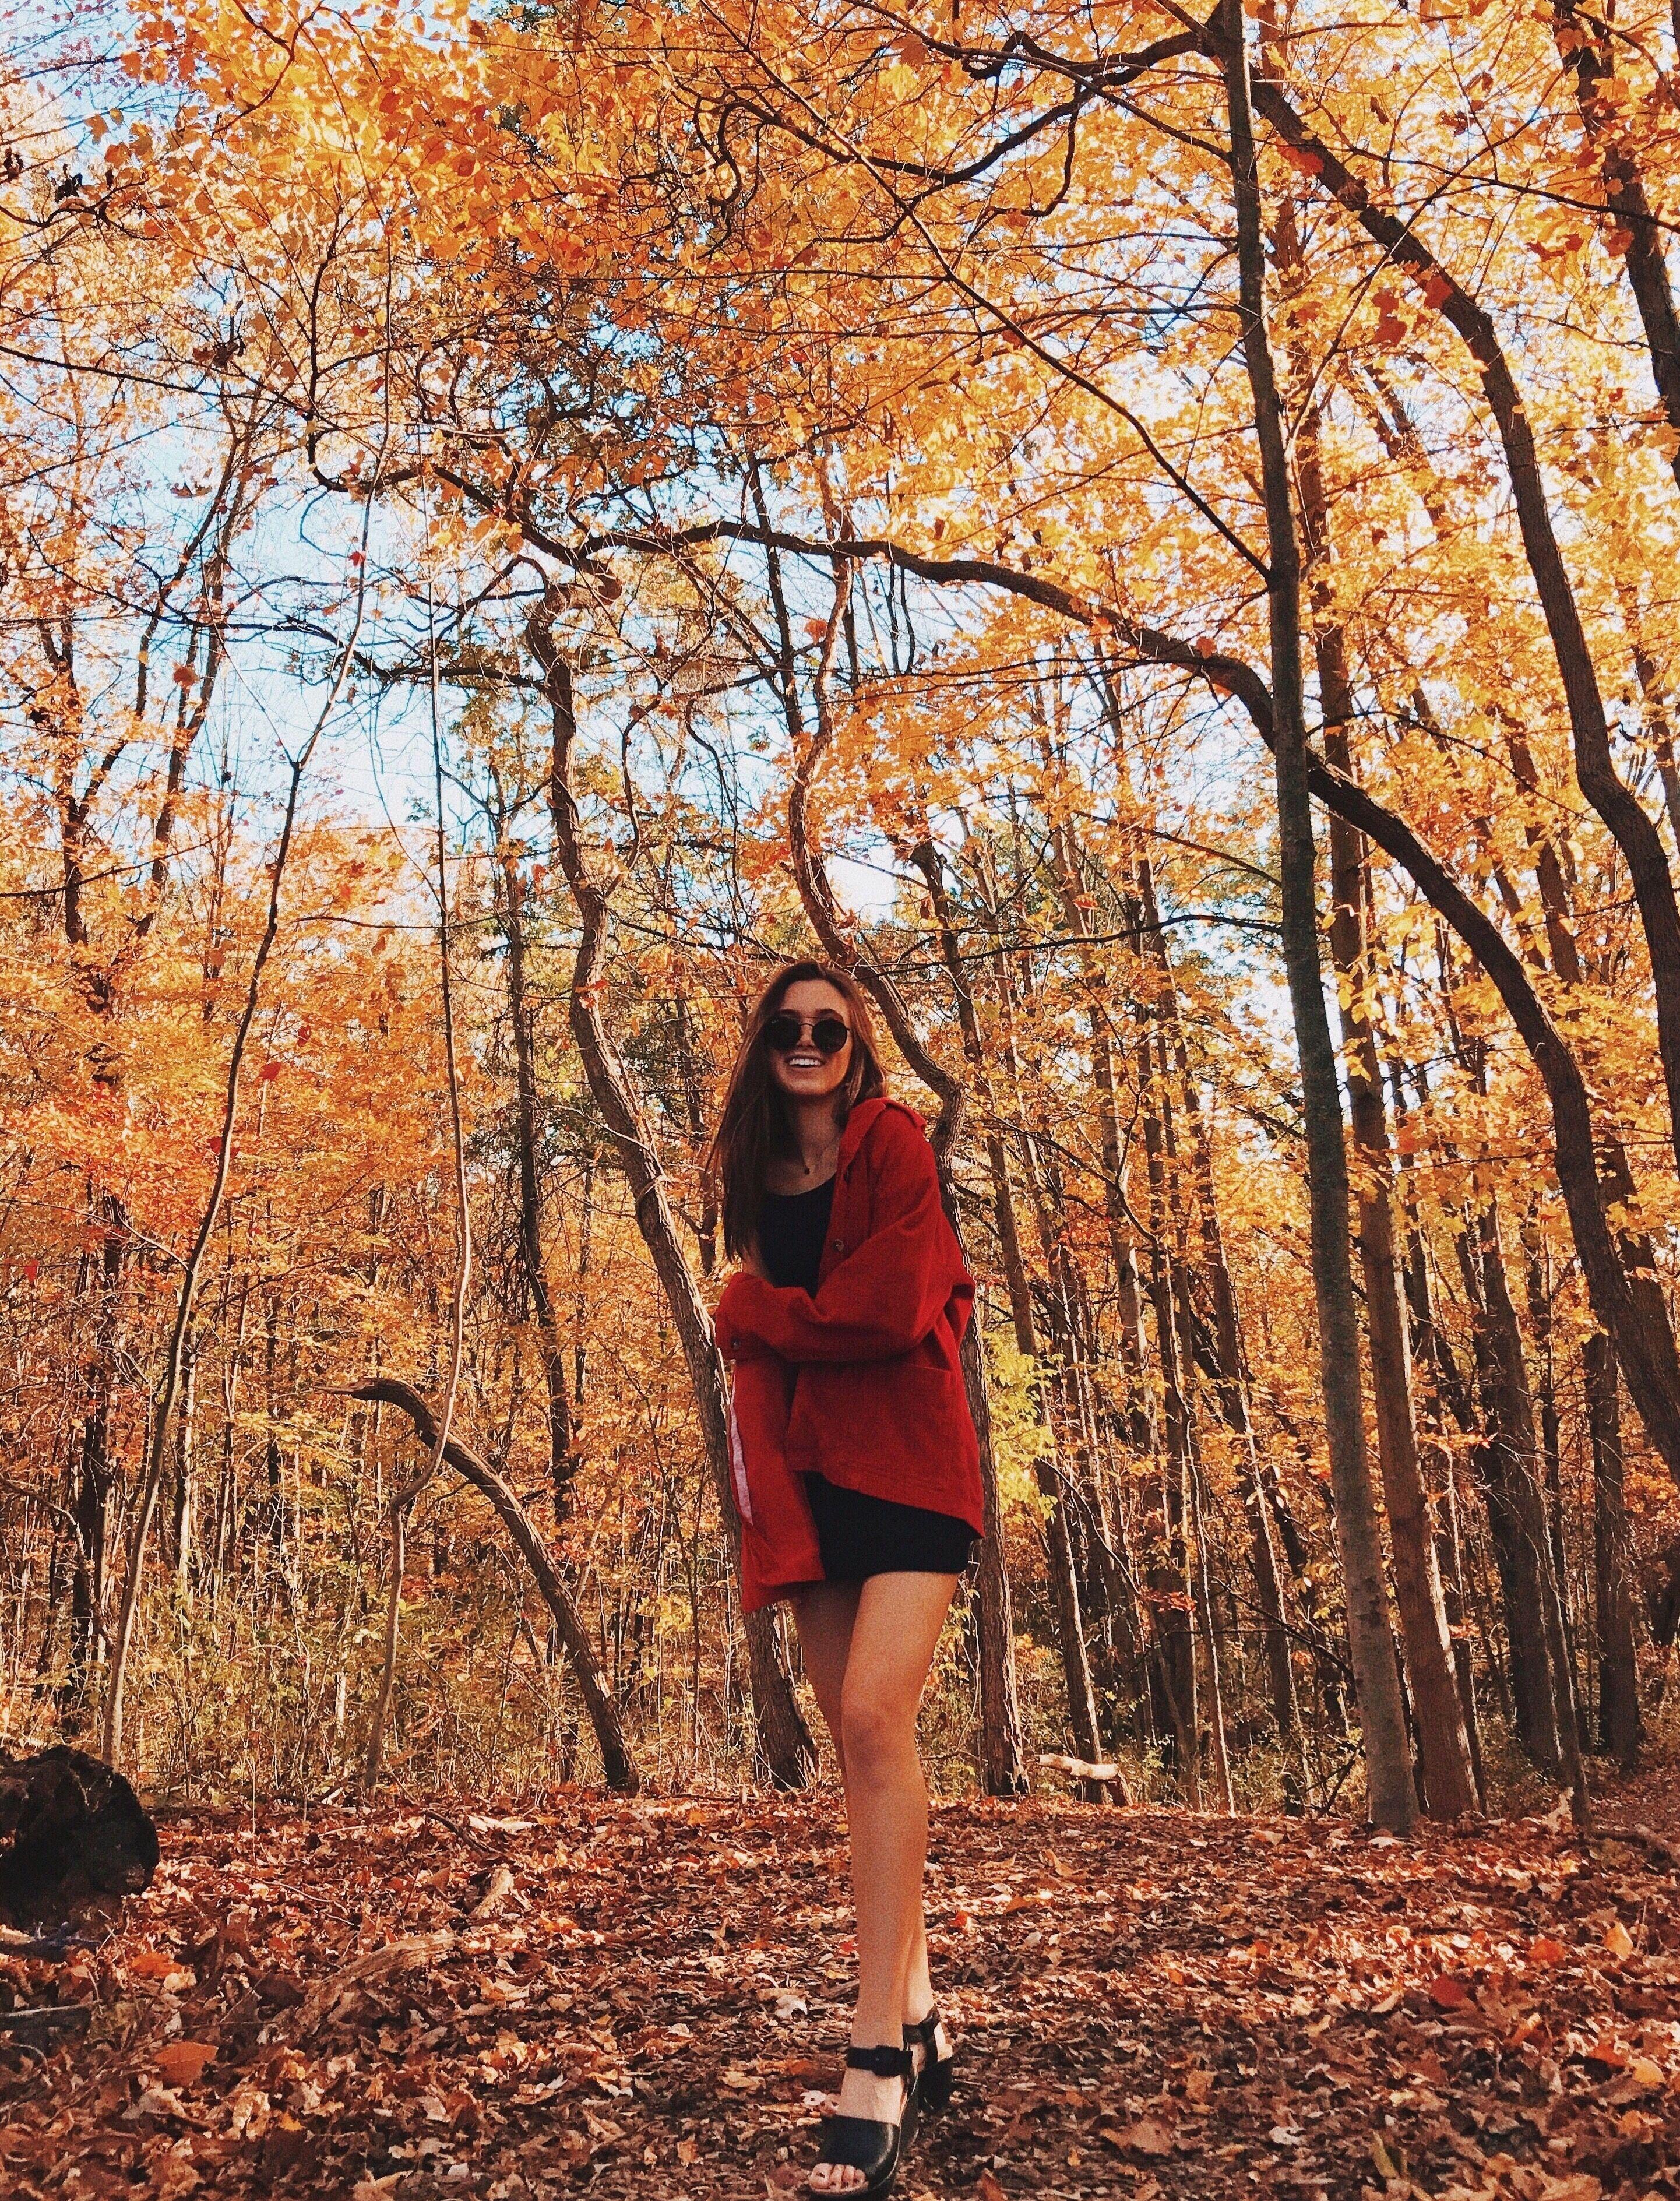 Instagram Pinterest Skyyamazin: In Love With Fall Instagram- @hannahmeloche Pinterest